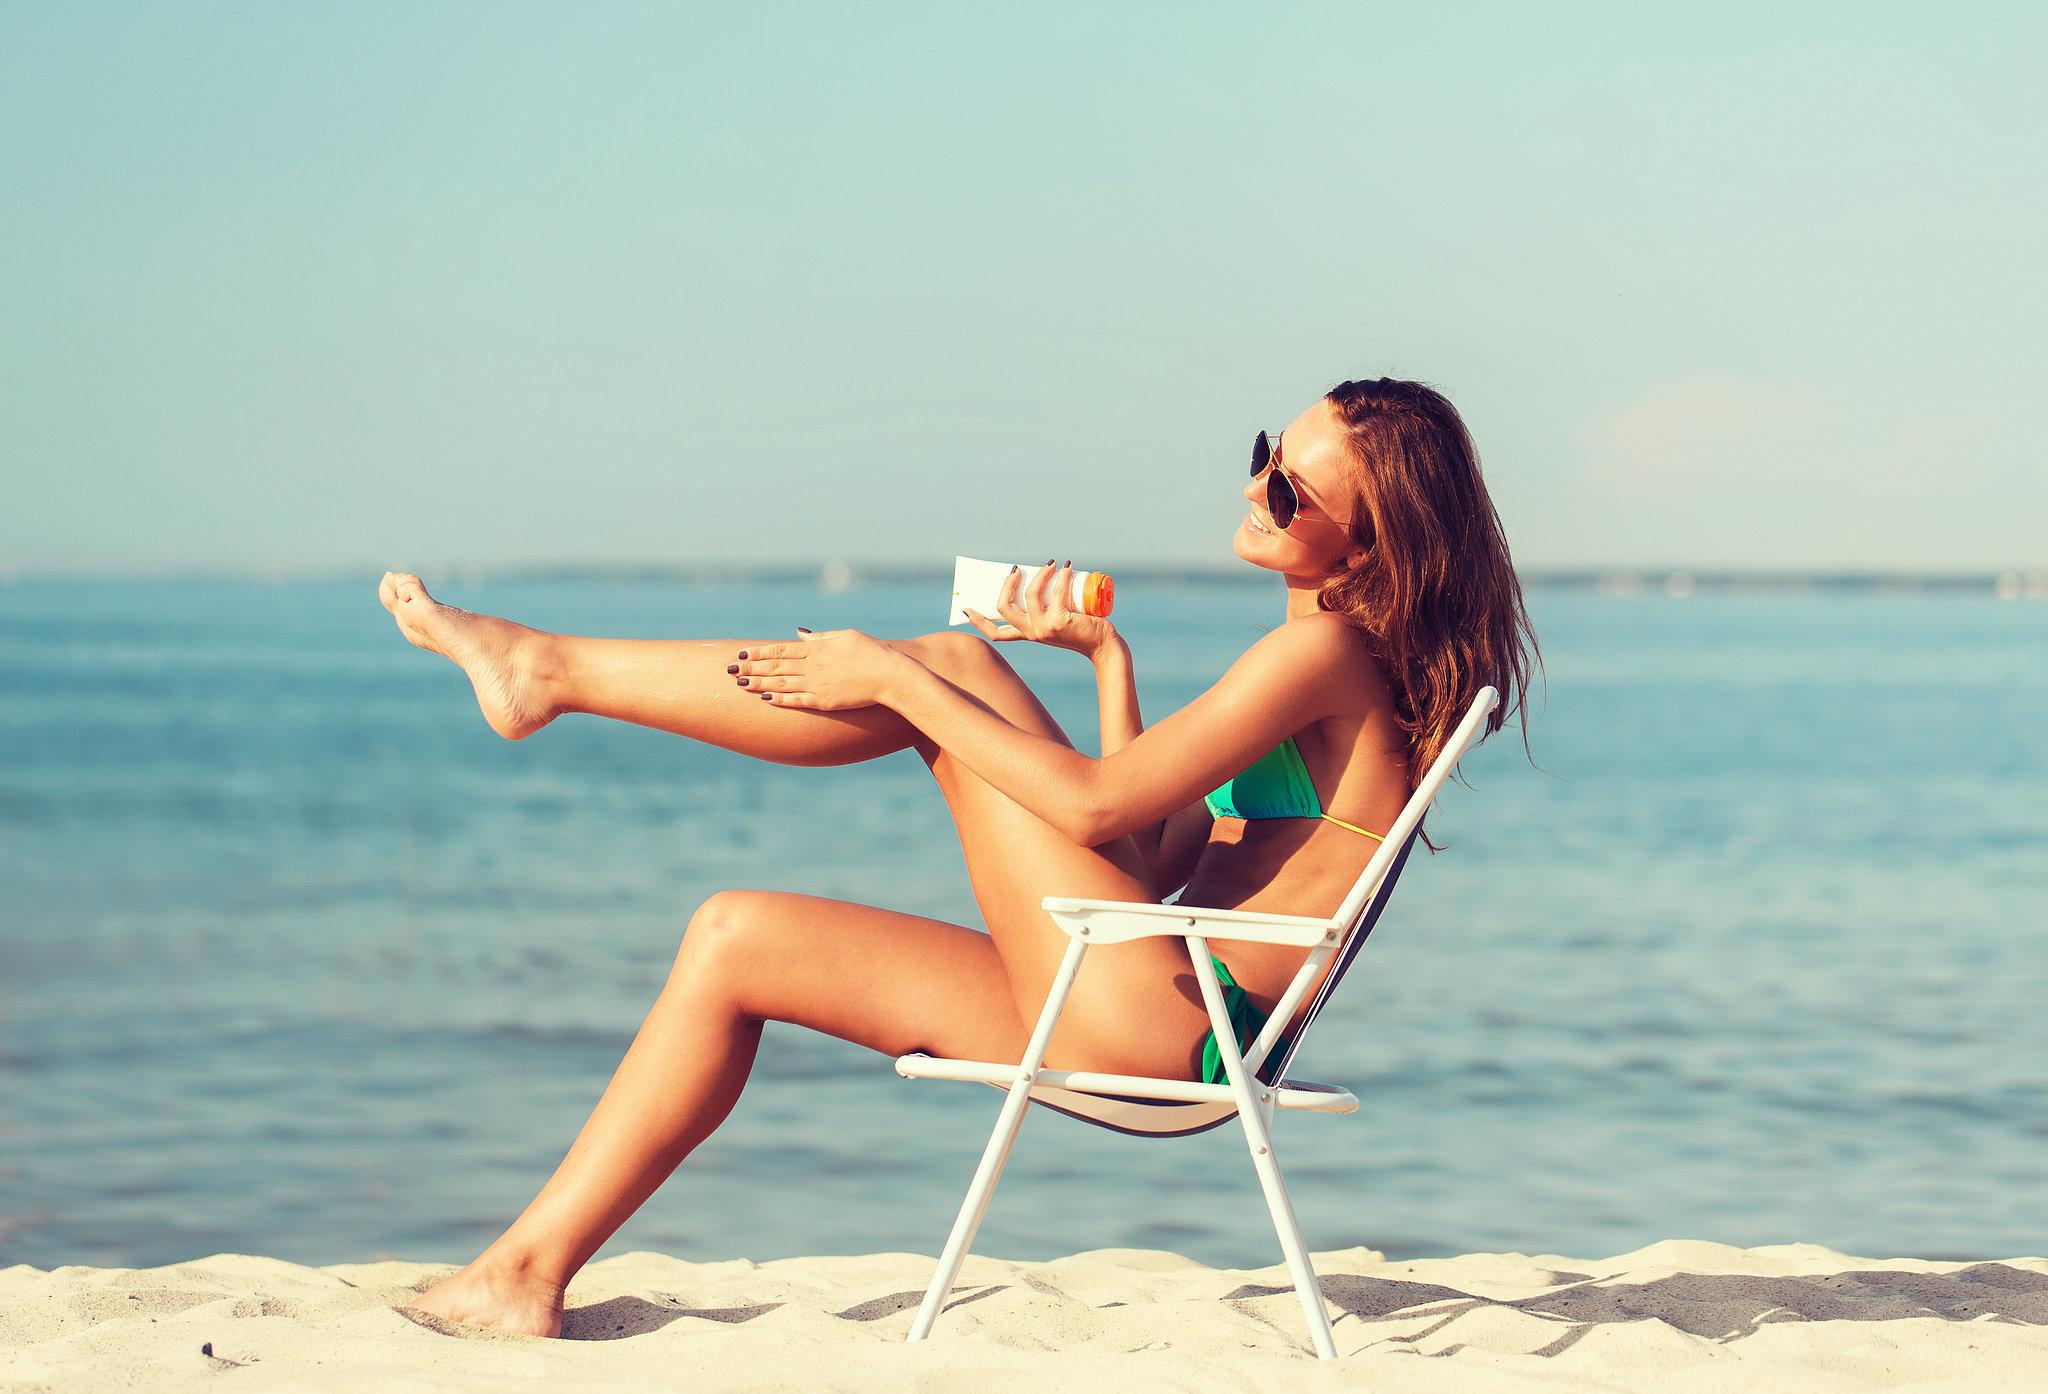 Gode råd om solkrem